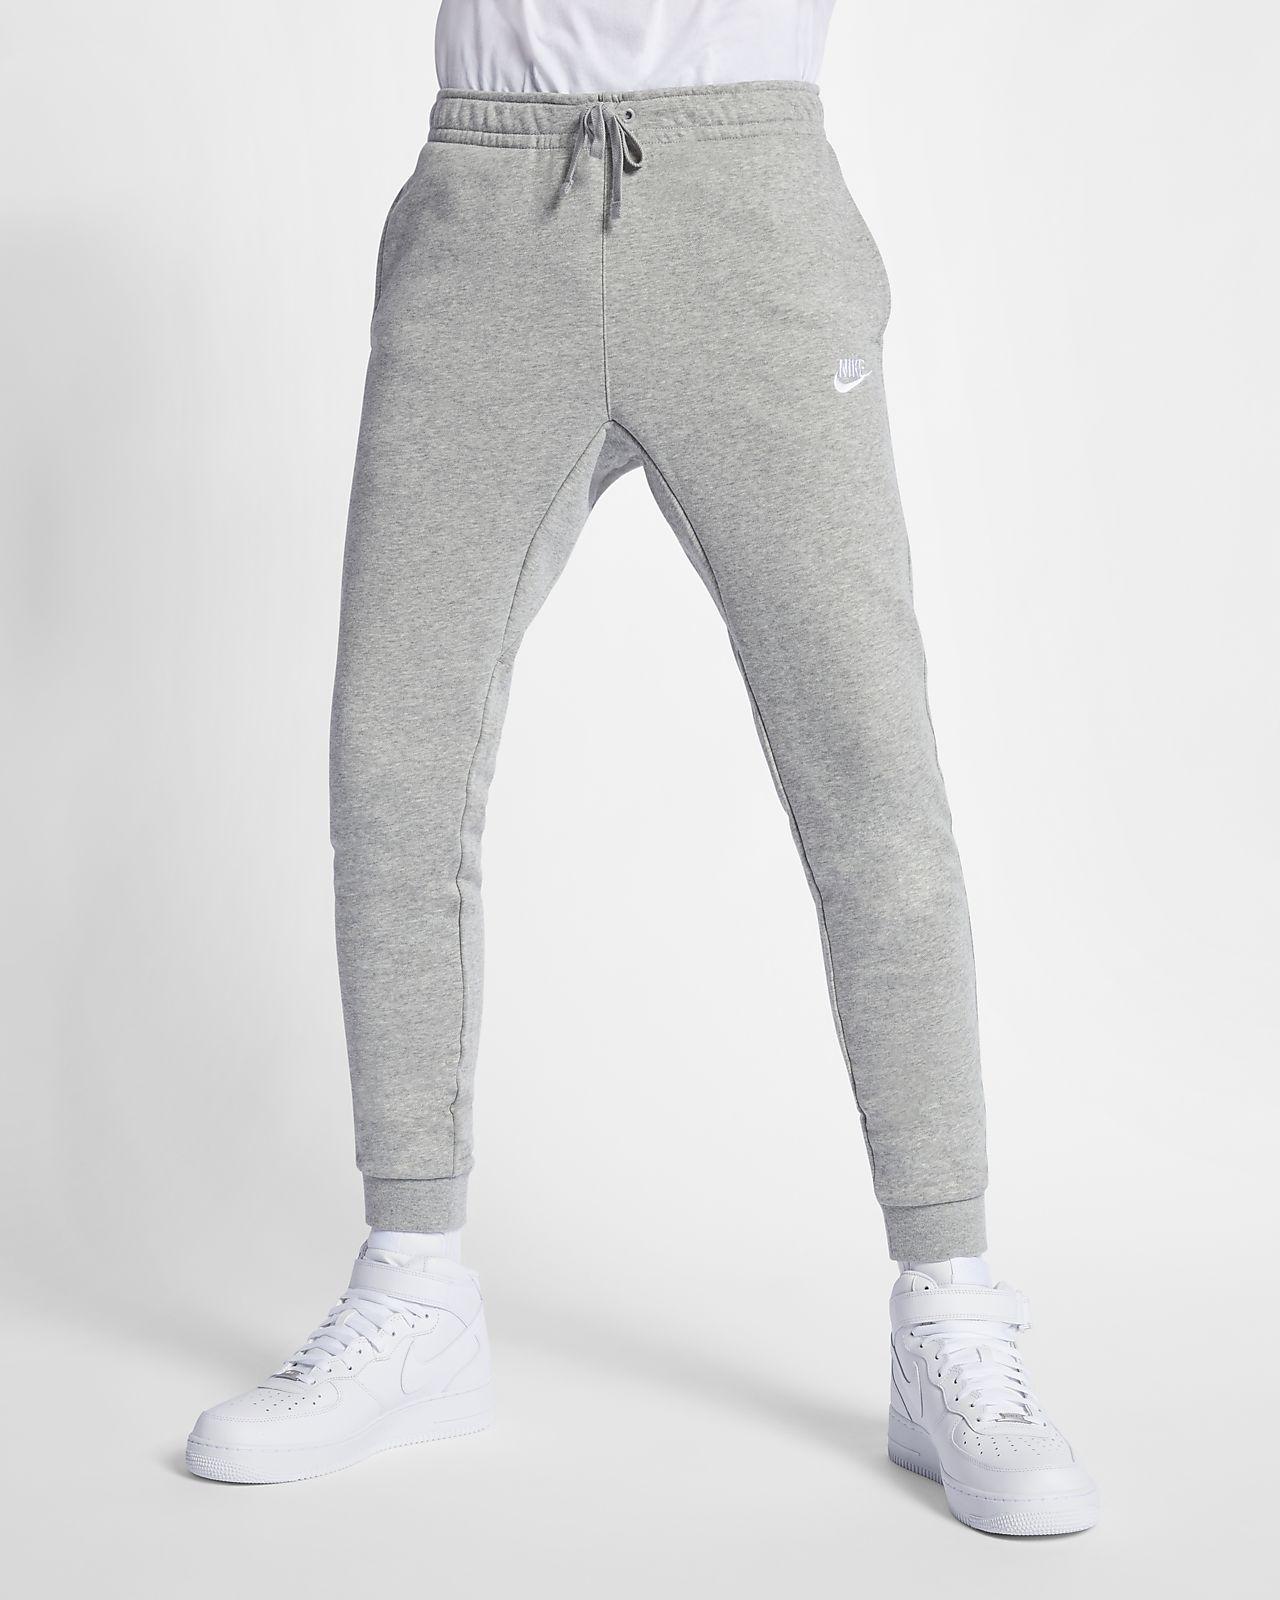 check out 81807 58079 Nike Sportswear Men s Joggers. Nike.com GB